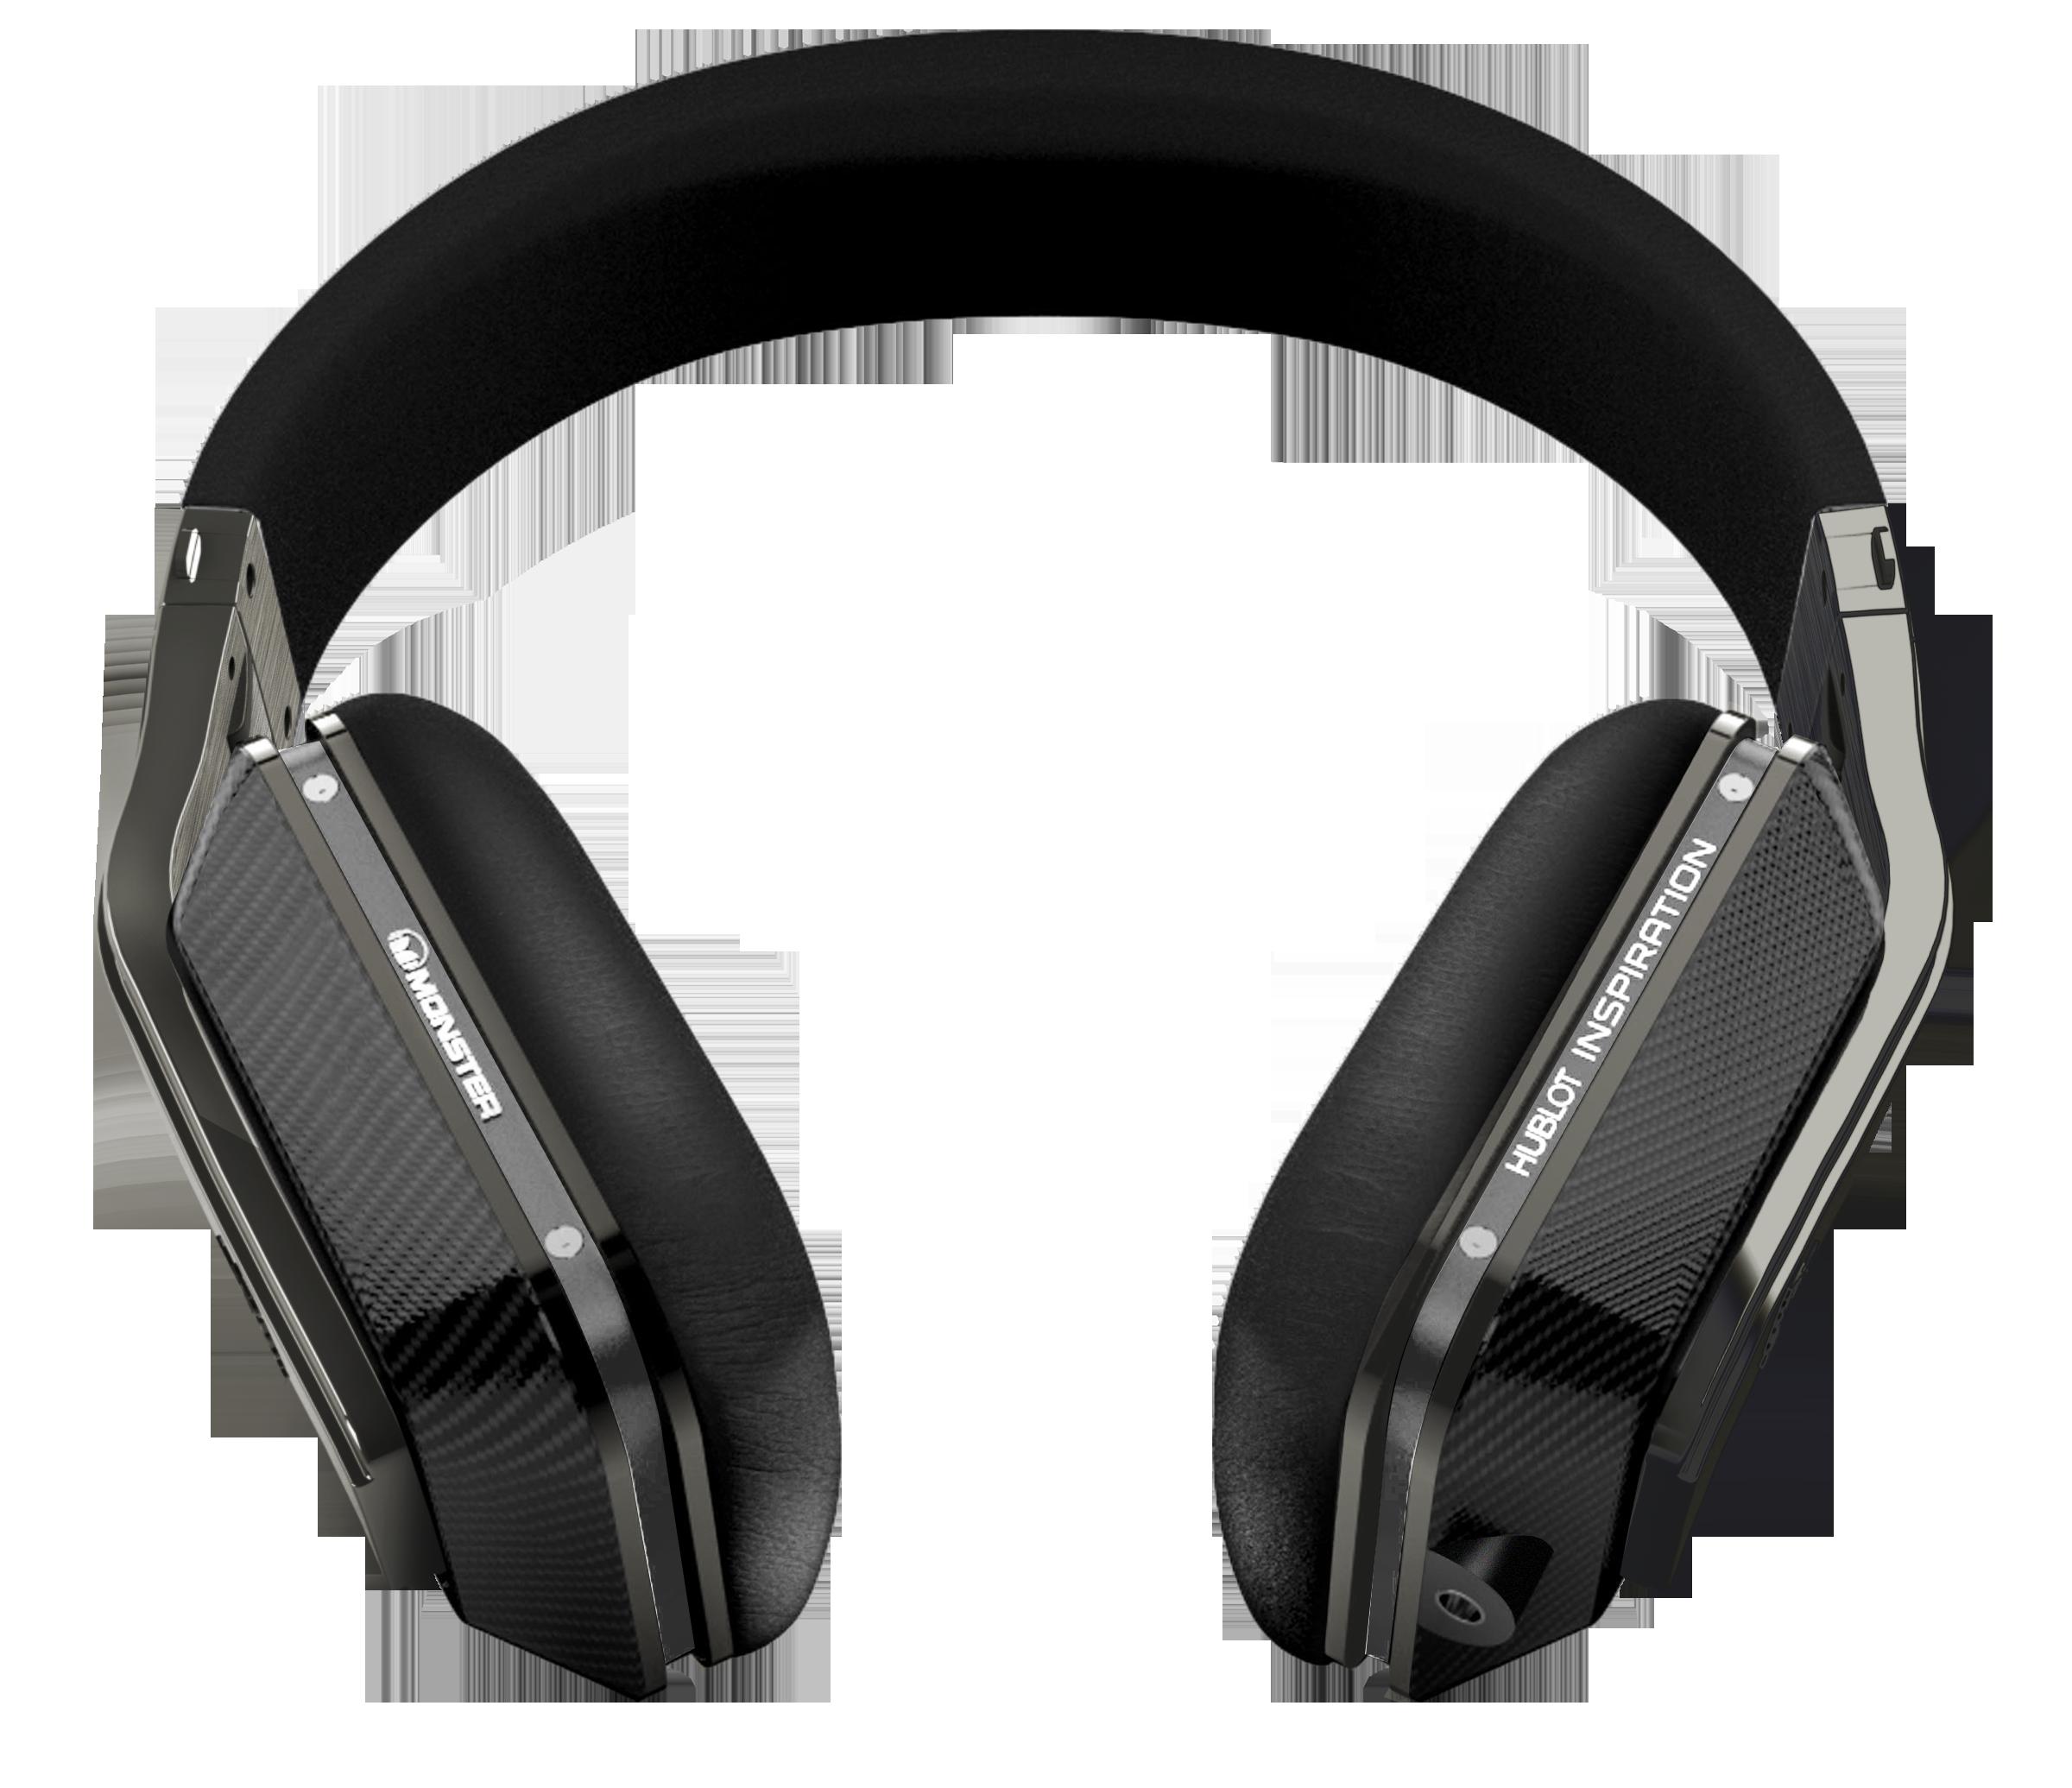 Music Headphone Png Image Headphones Music Headphones Headphone